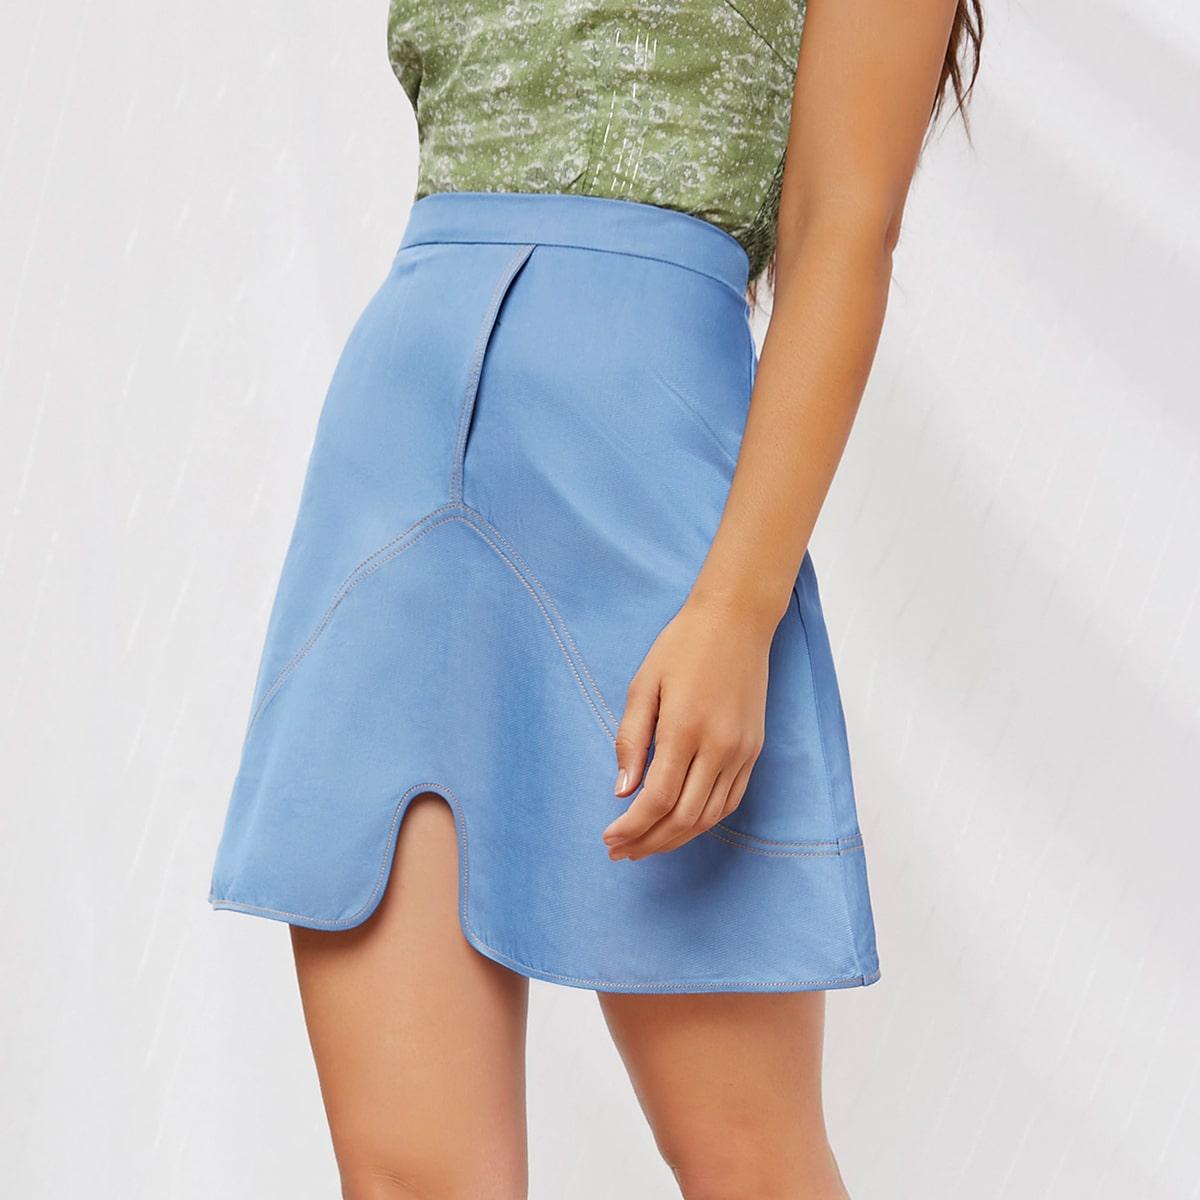 SHEIN / Zipper Side Contrast Stitch Split Hem Skirt